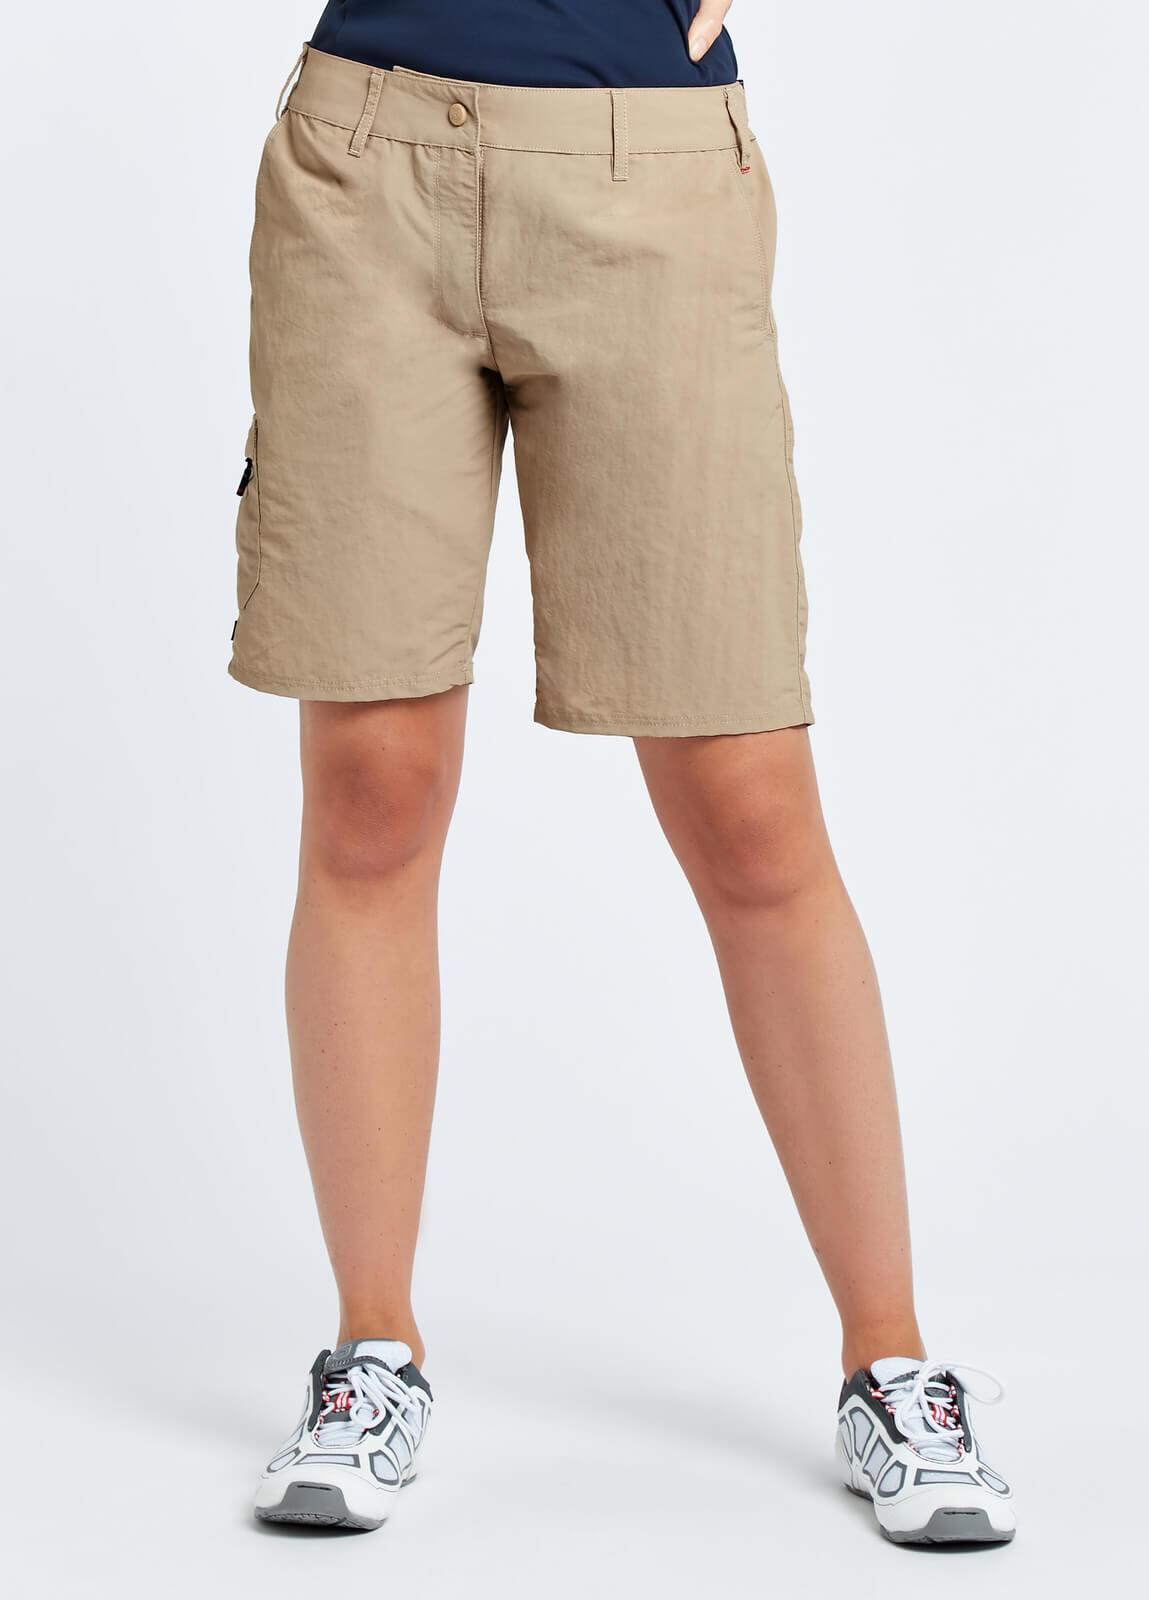 Minorca Womens Crew Shorts - Sand